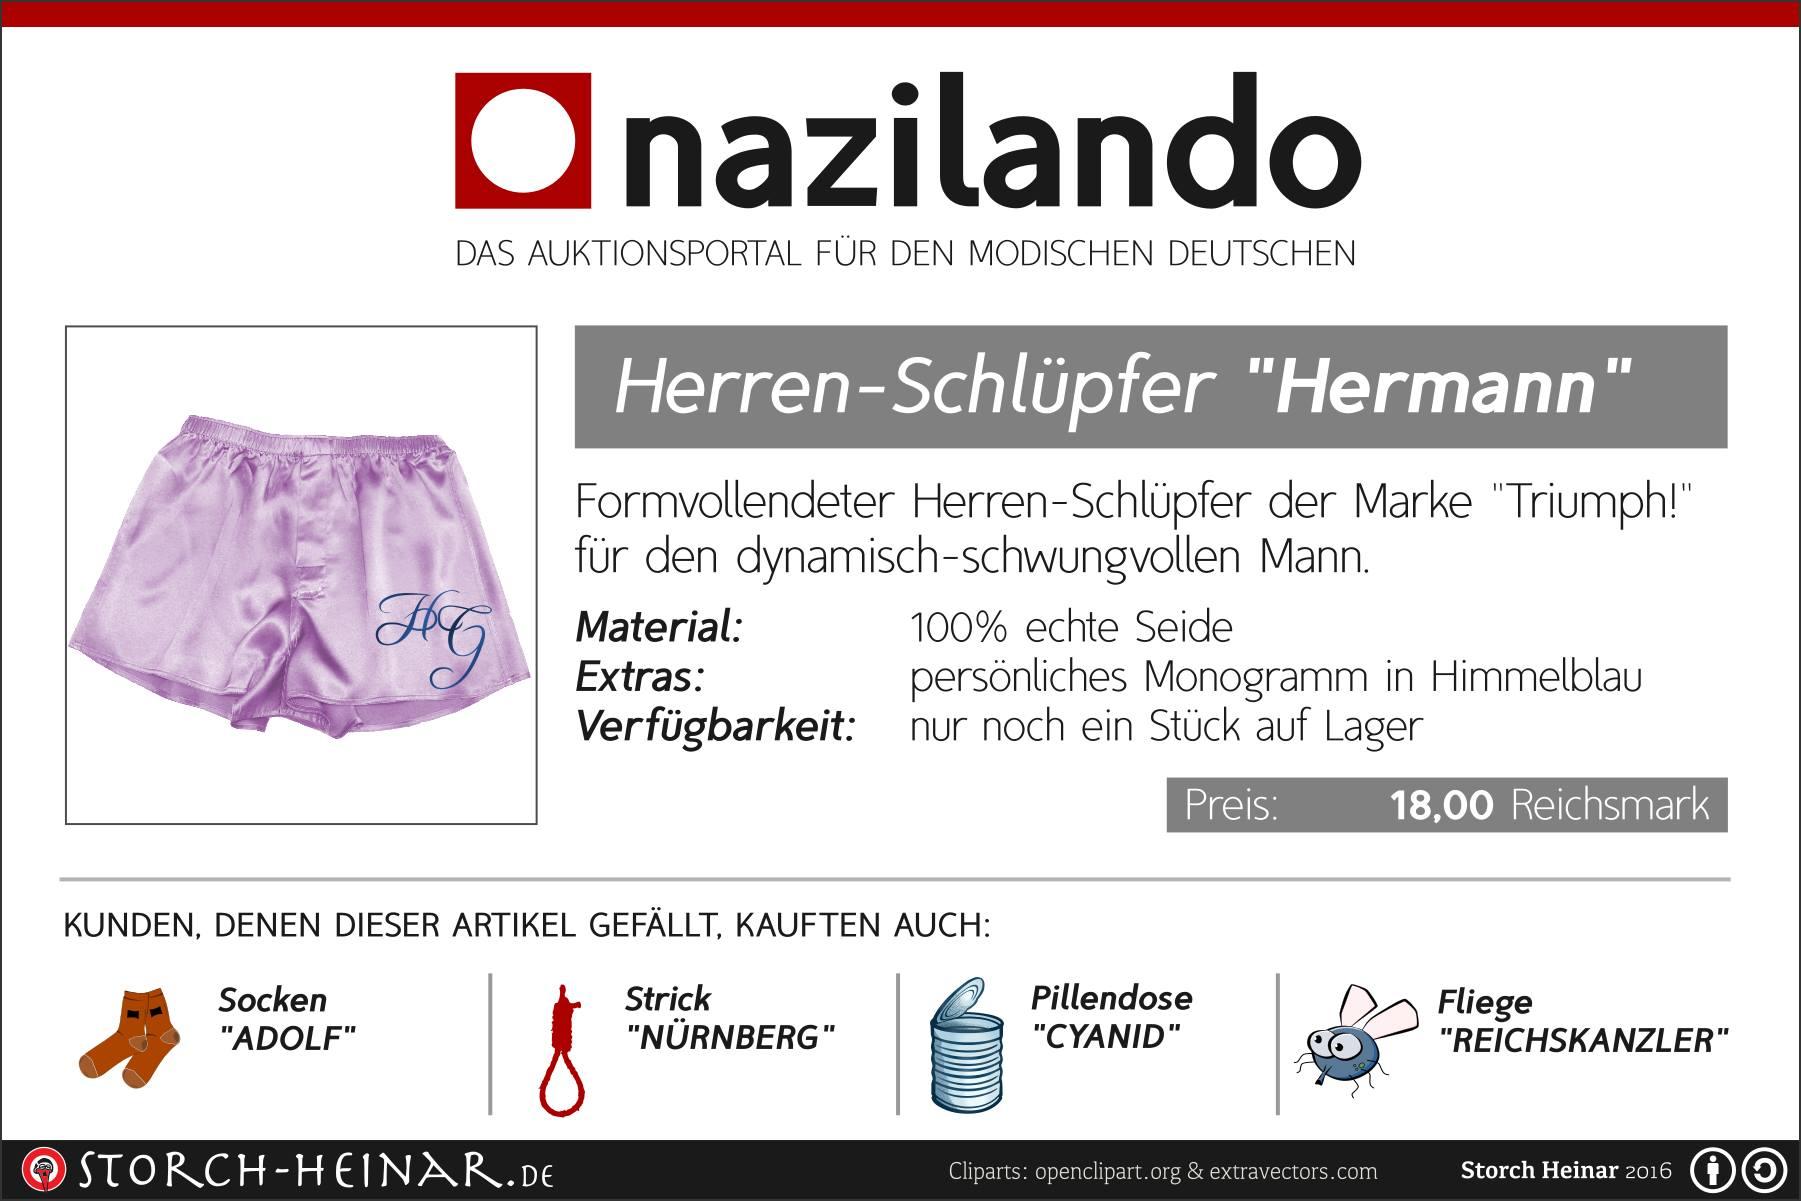 Auktion Fur Nazi Devotionalien Gorings Unterhose Unterm Hammer Endstation Rechts